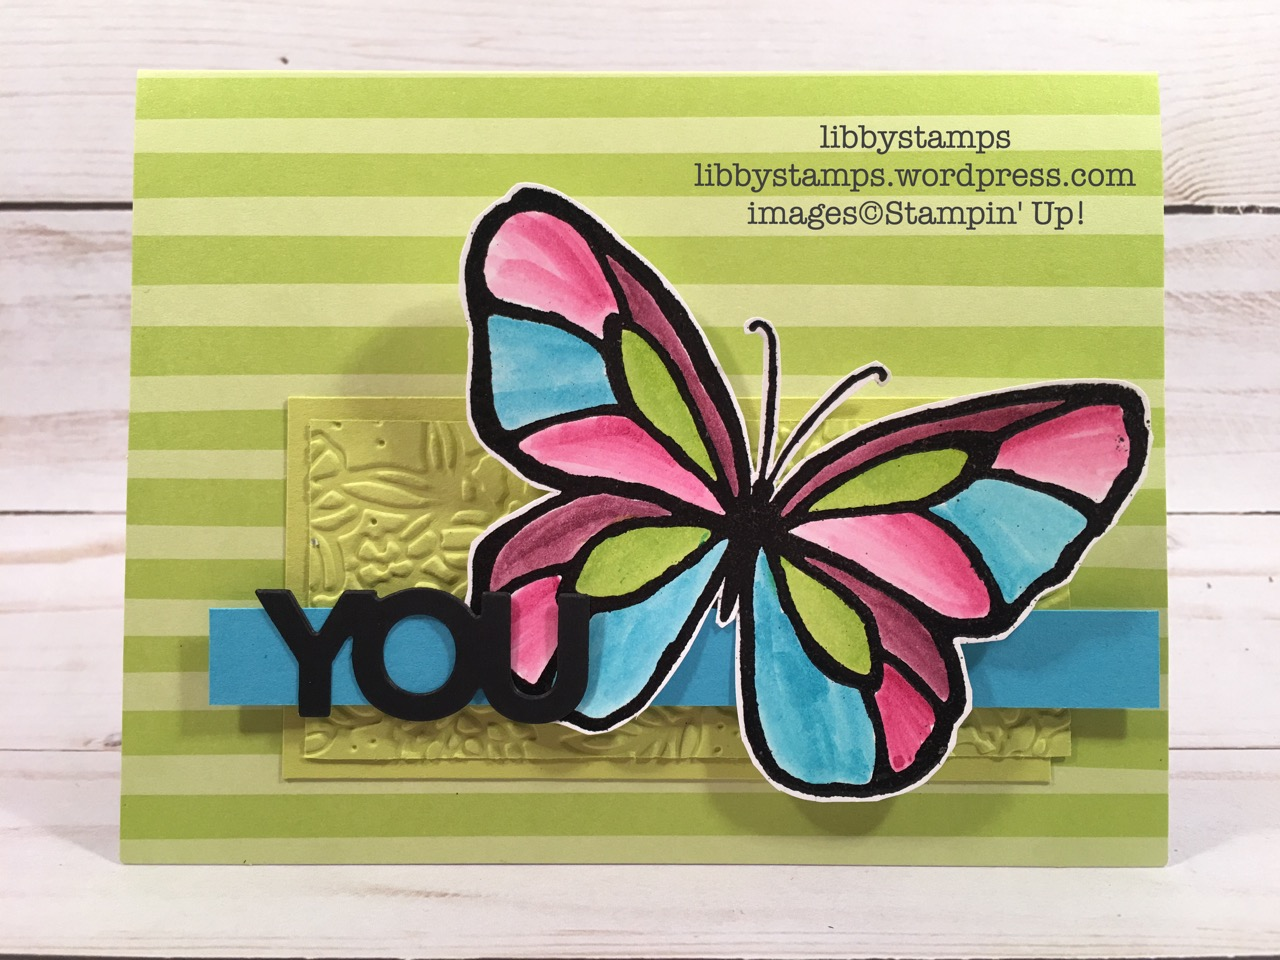 libbystamps, stampin up, Beautiful Day, Aqua Painter, Celebrate You Thinlits, Petal Pair Embossing Folder, CCMC